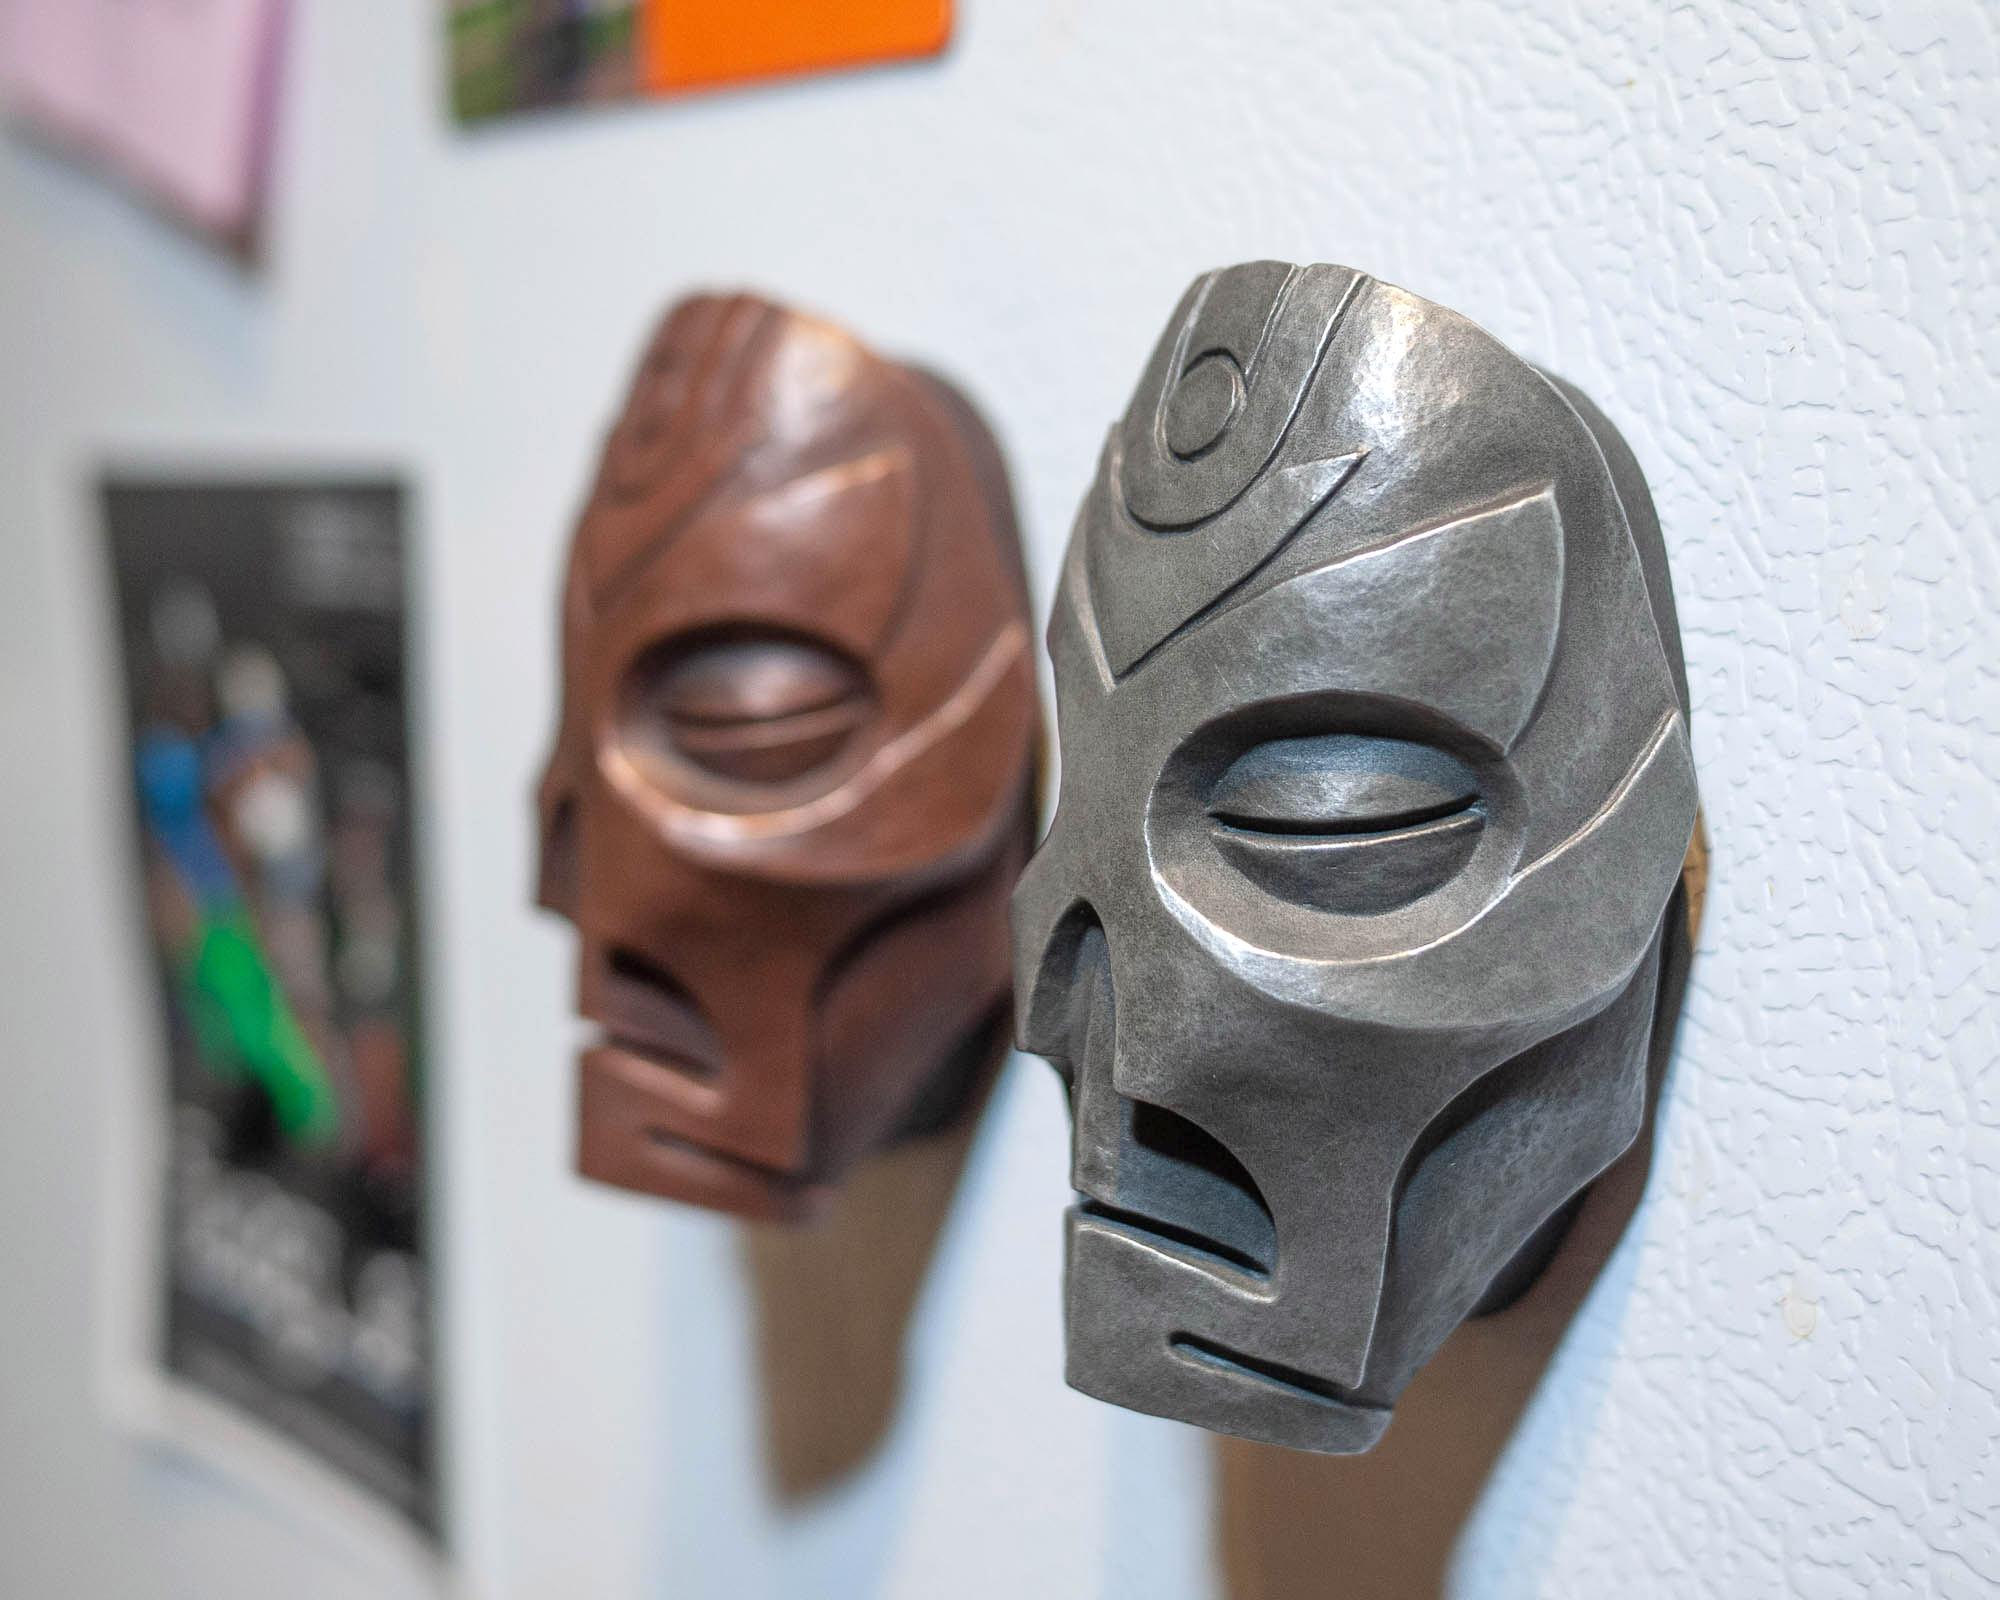 skyrim-dragon-priest-mini-mask-magnets-on-fridge.jpg